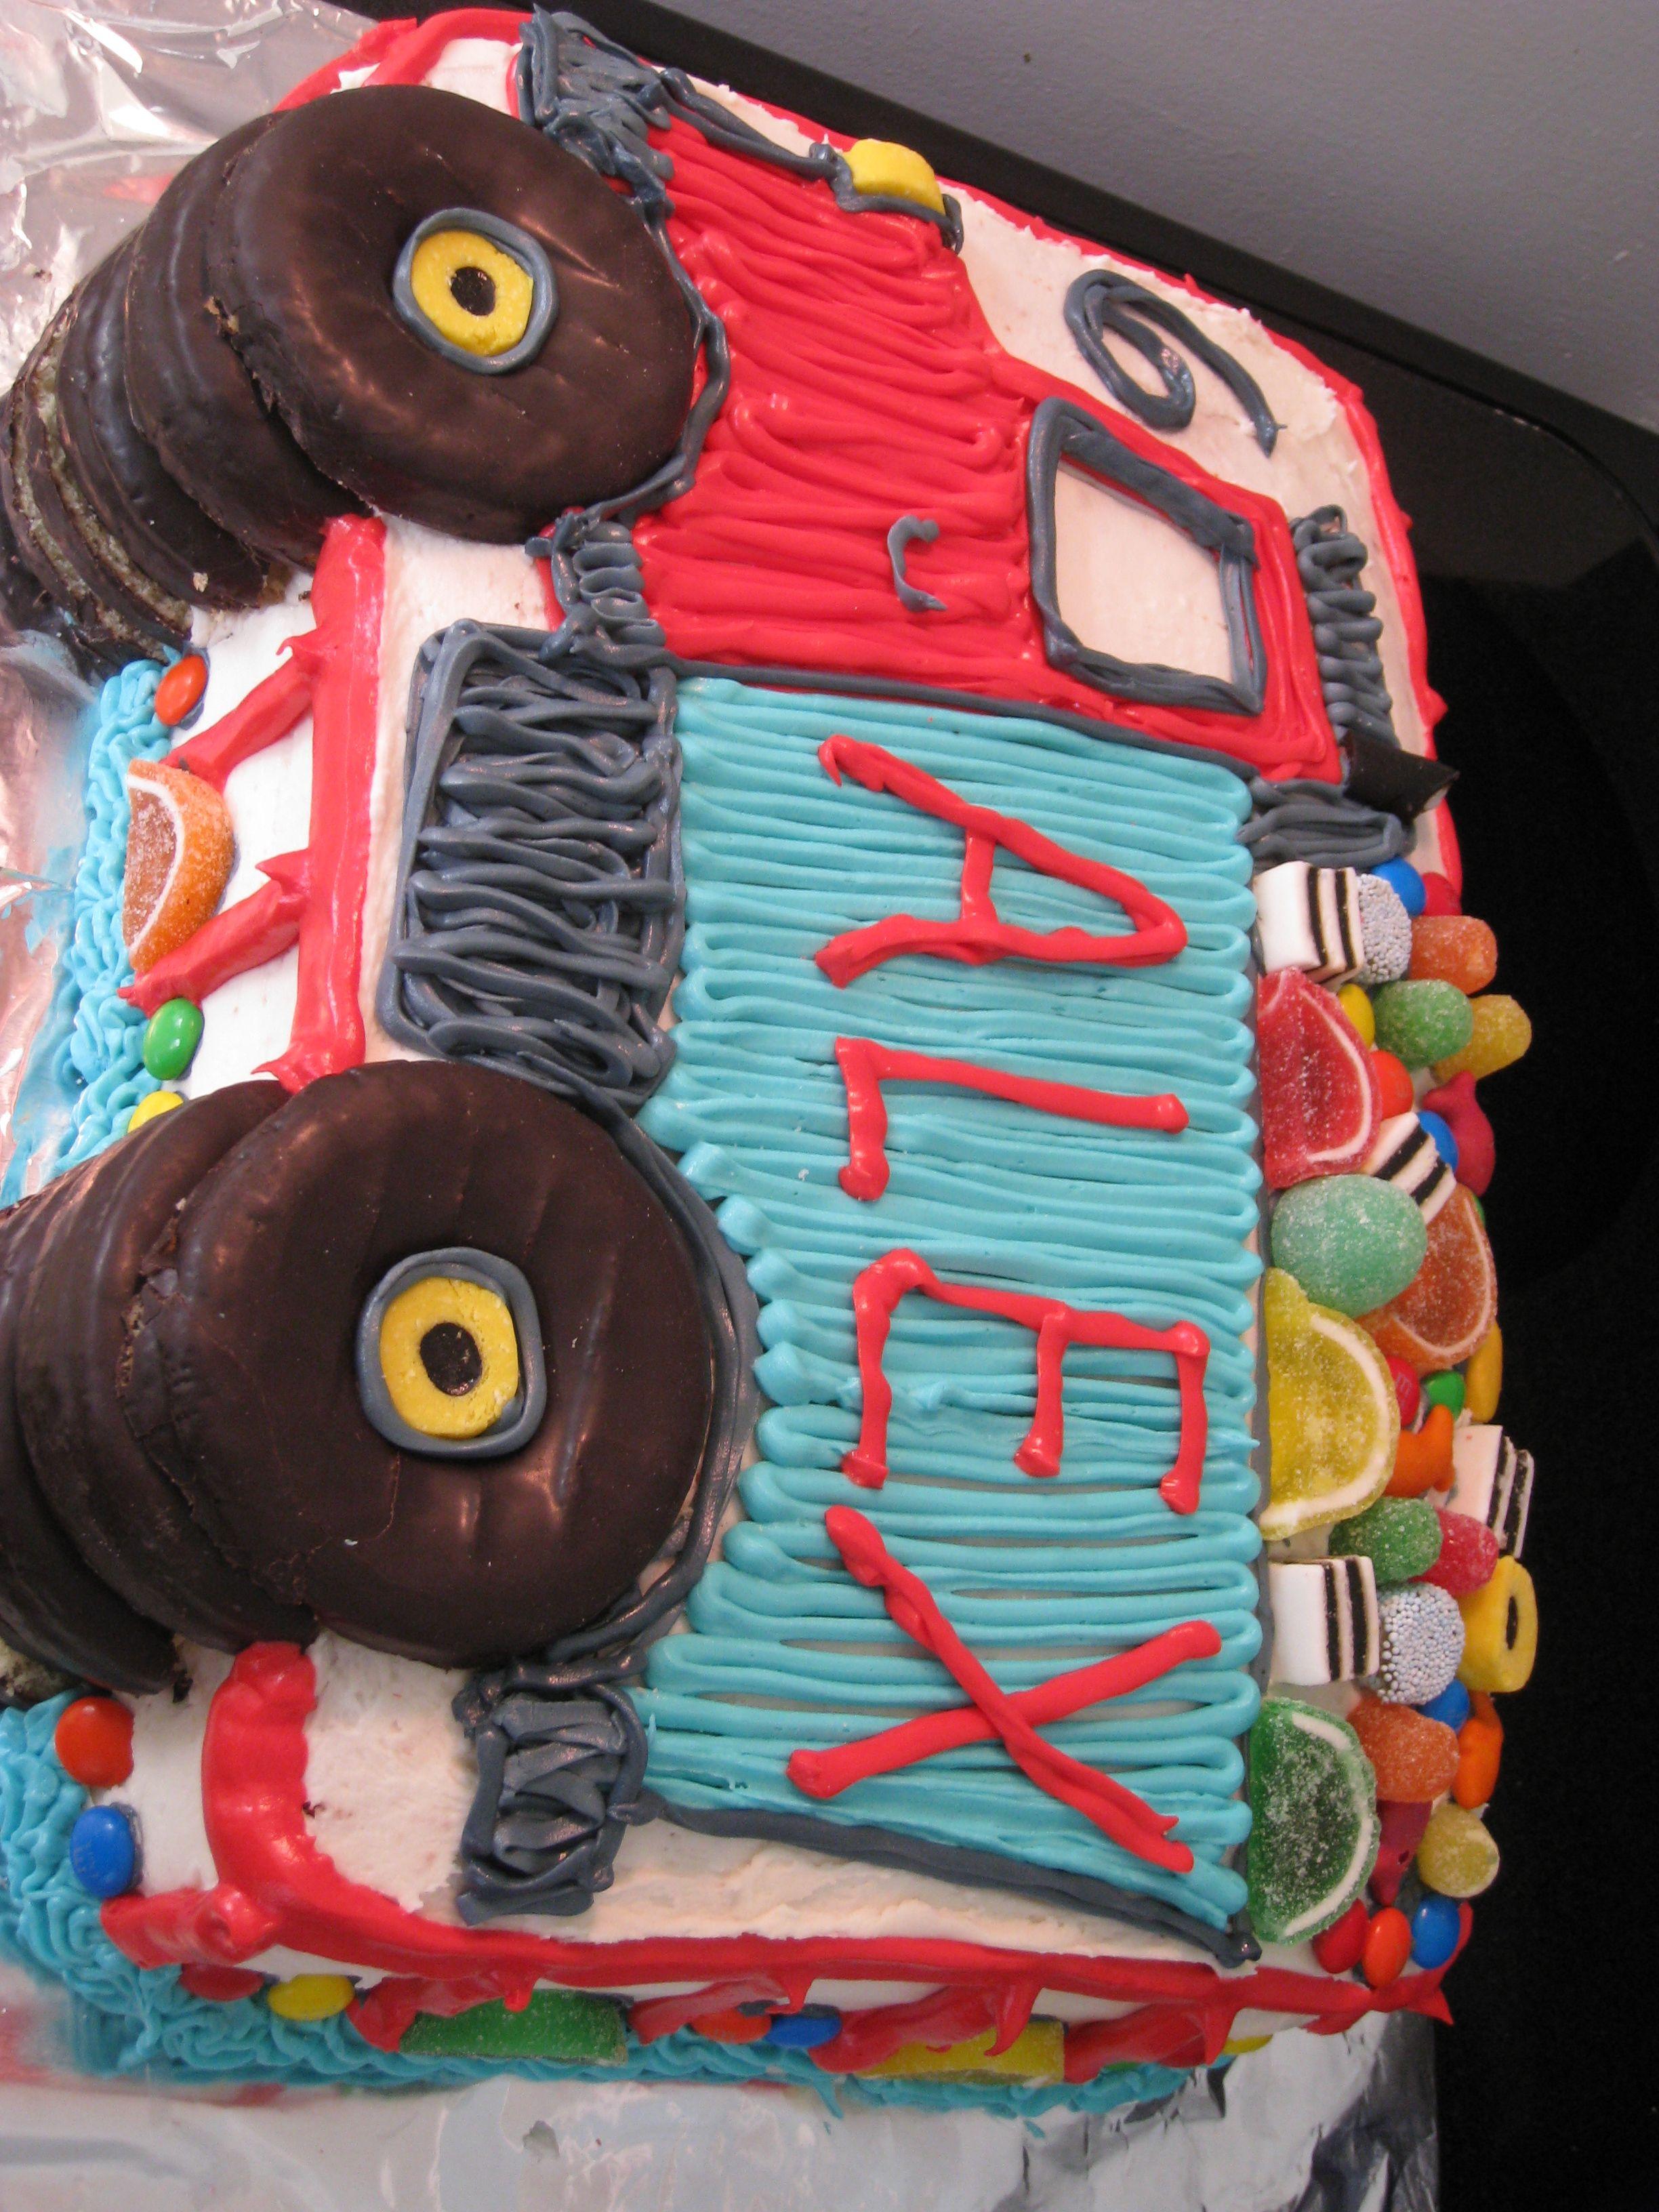 Boys Dump truck cake Natashas Treats Pinterest Dump truck